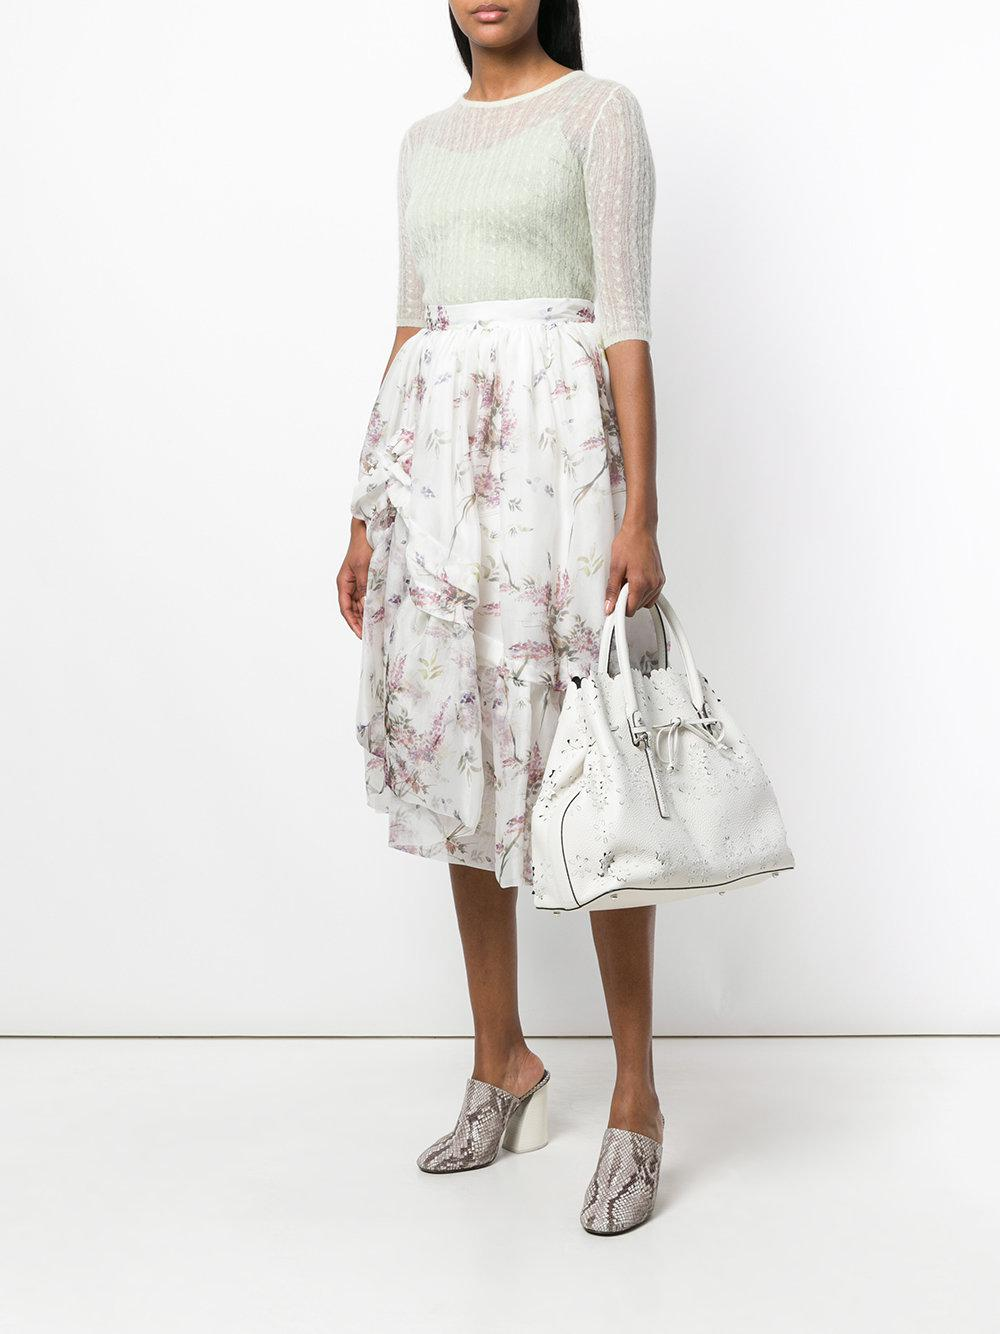 Ermanno Scervino Leather Floral Laser-cut Tote in White